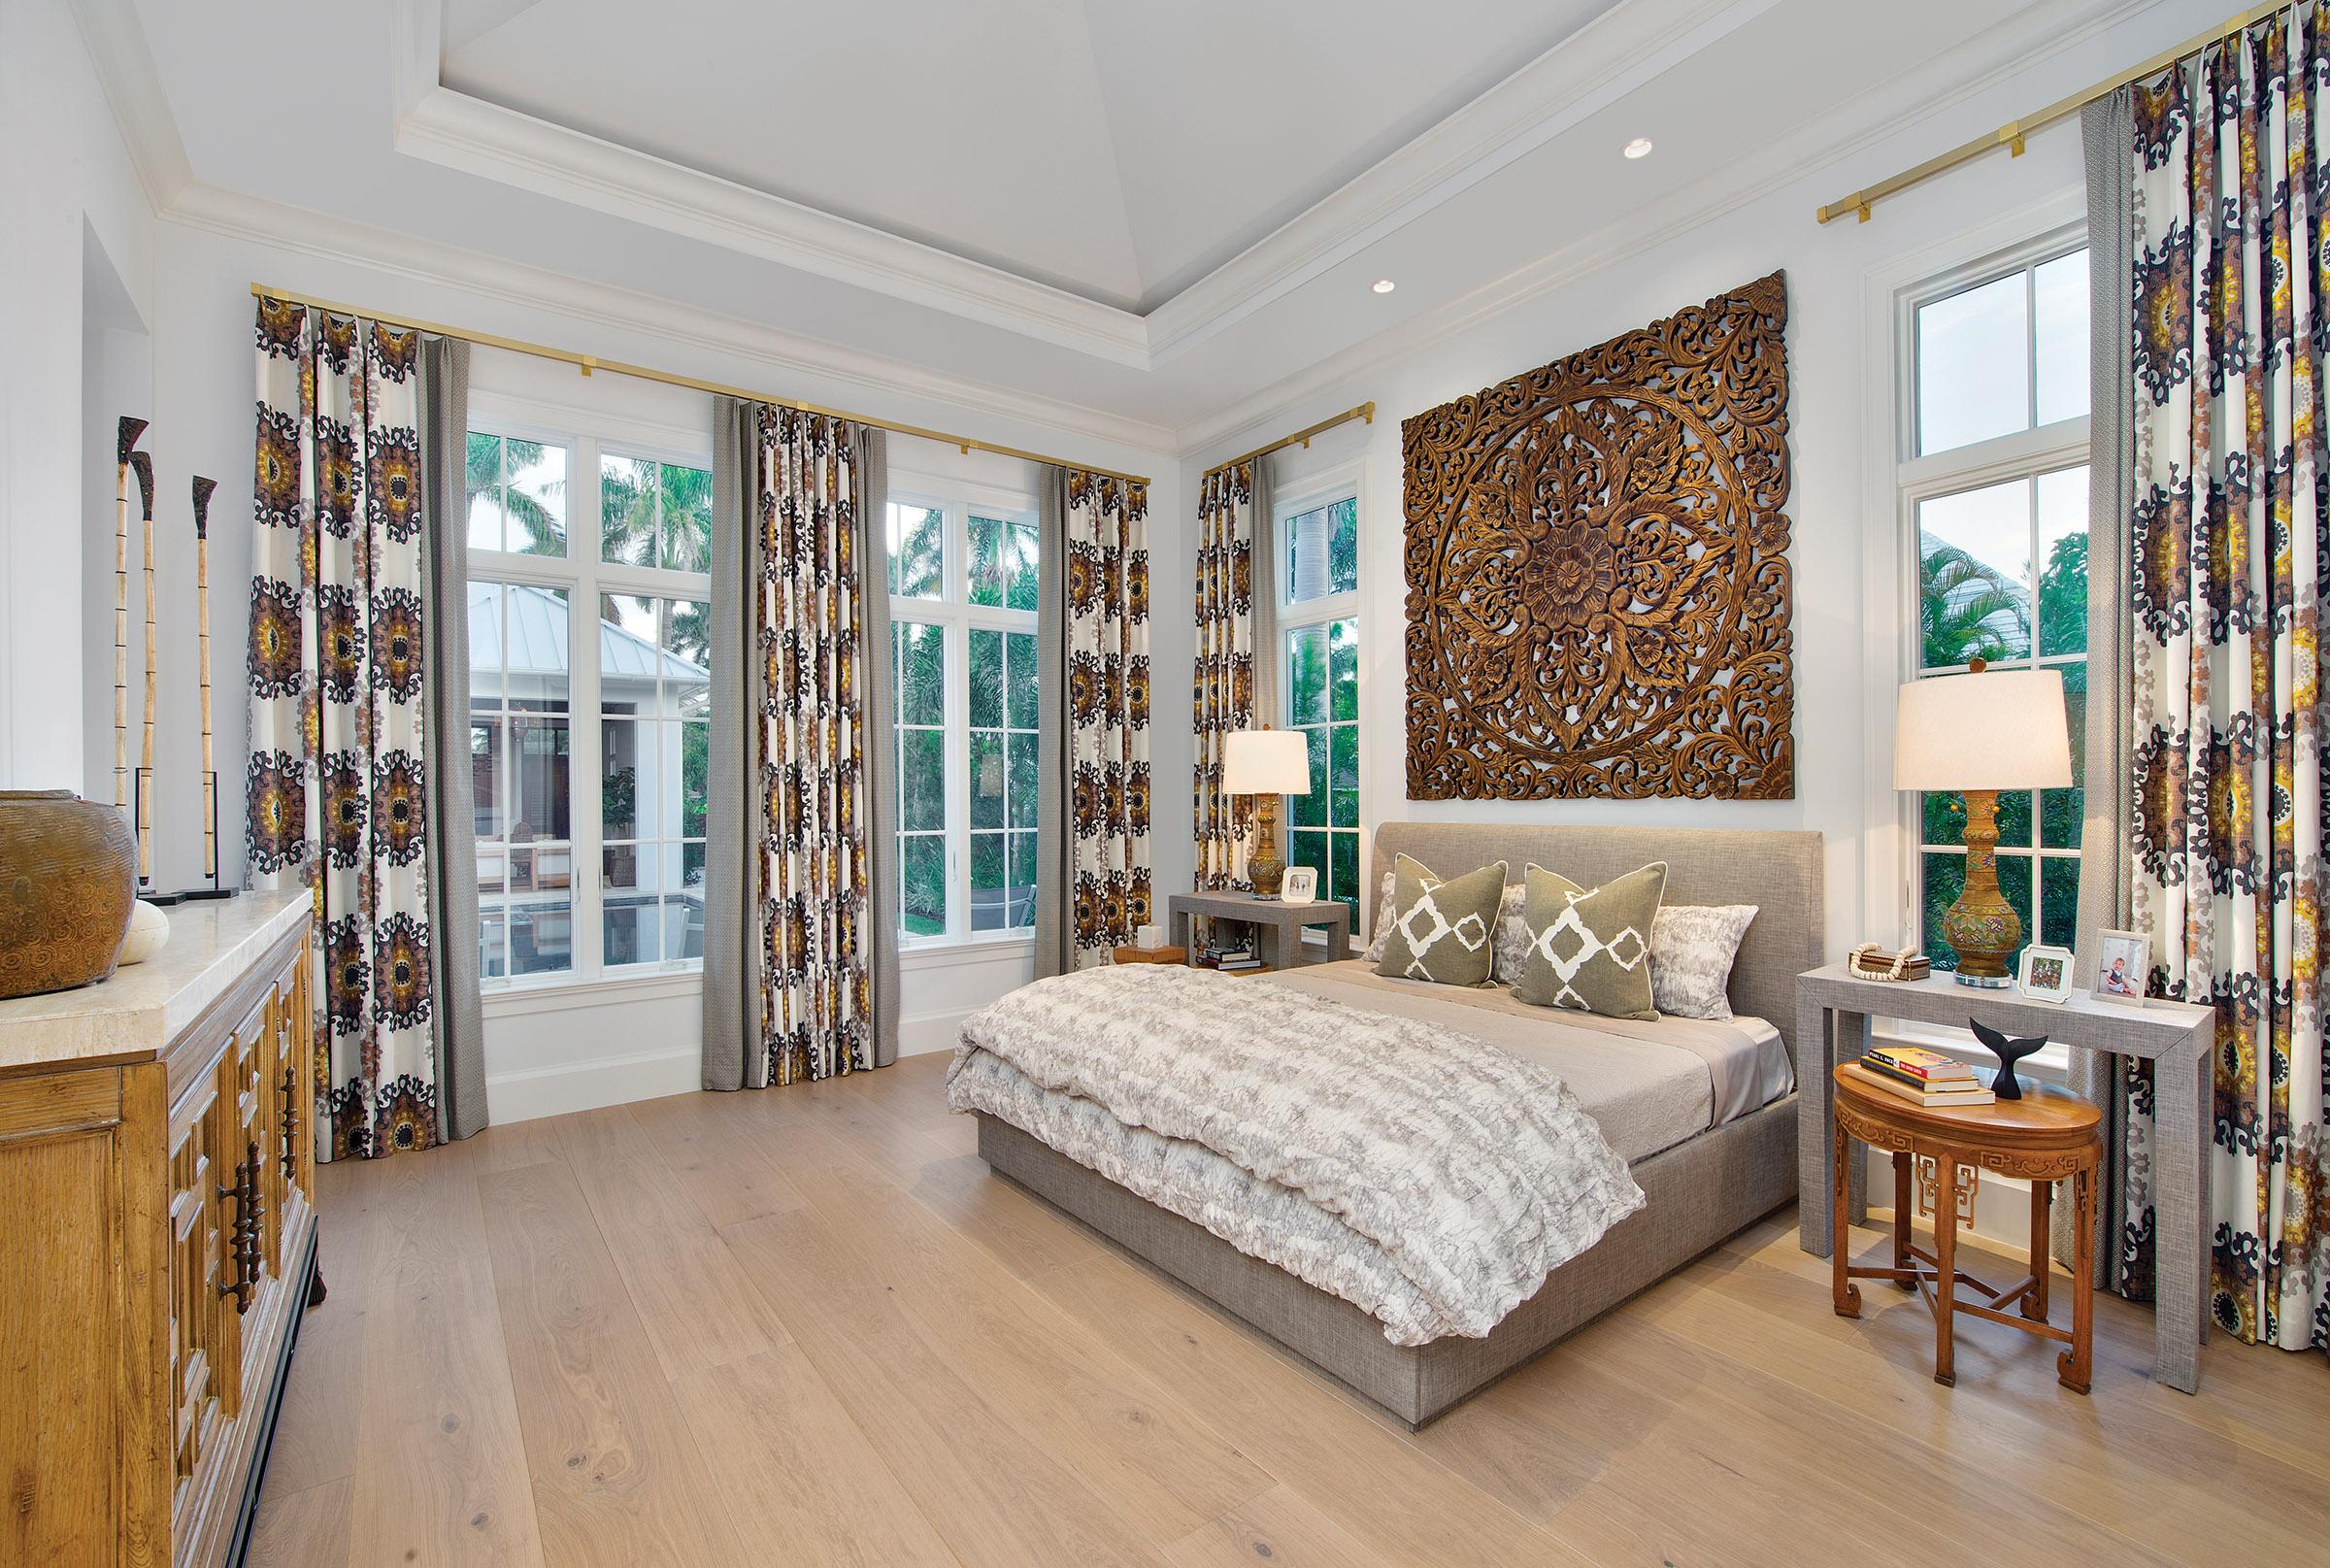 7.JeffreyFisher Master Bedroom Gio.jpg